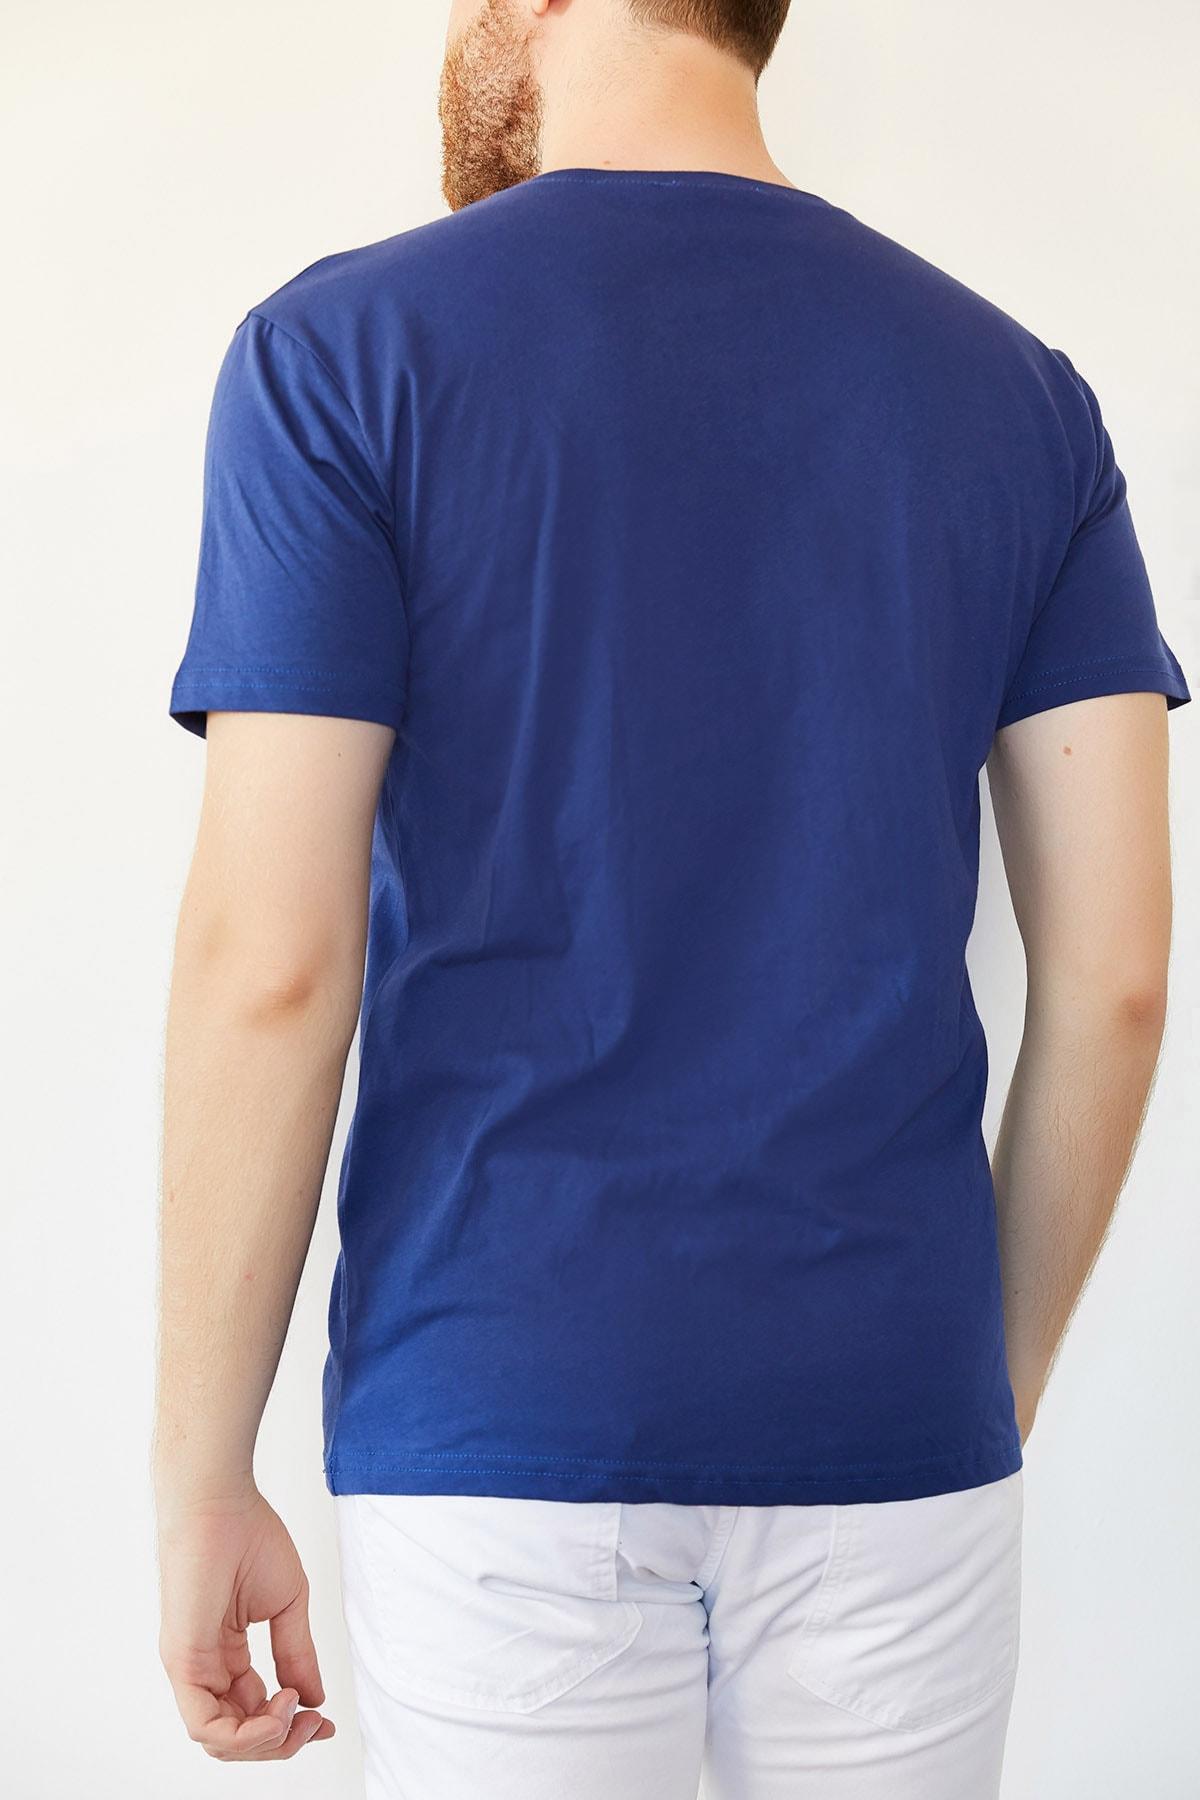 XHAN Erkek Lacivert Indigo V Yaka Basic T-shirt 0yxe1-44123-27 2